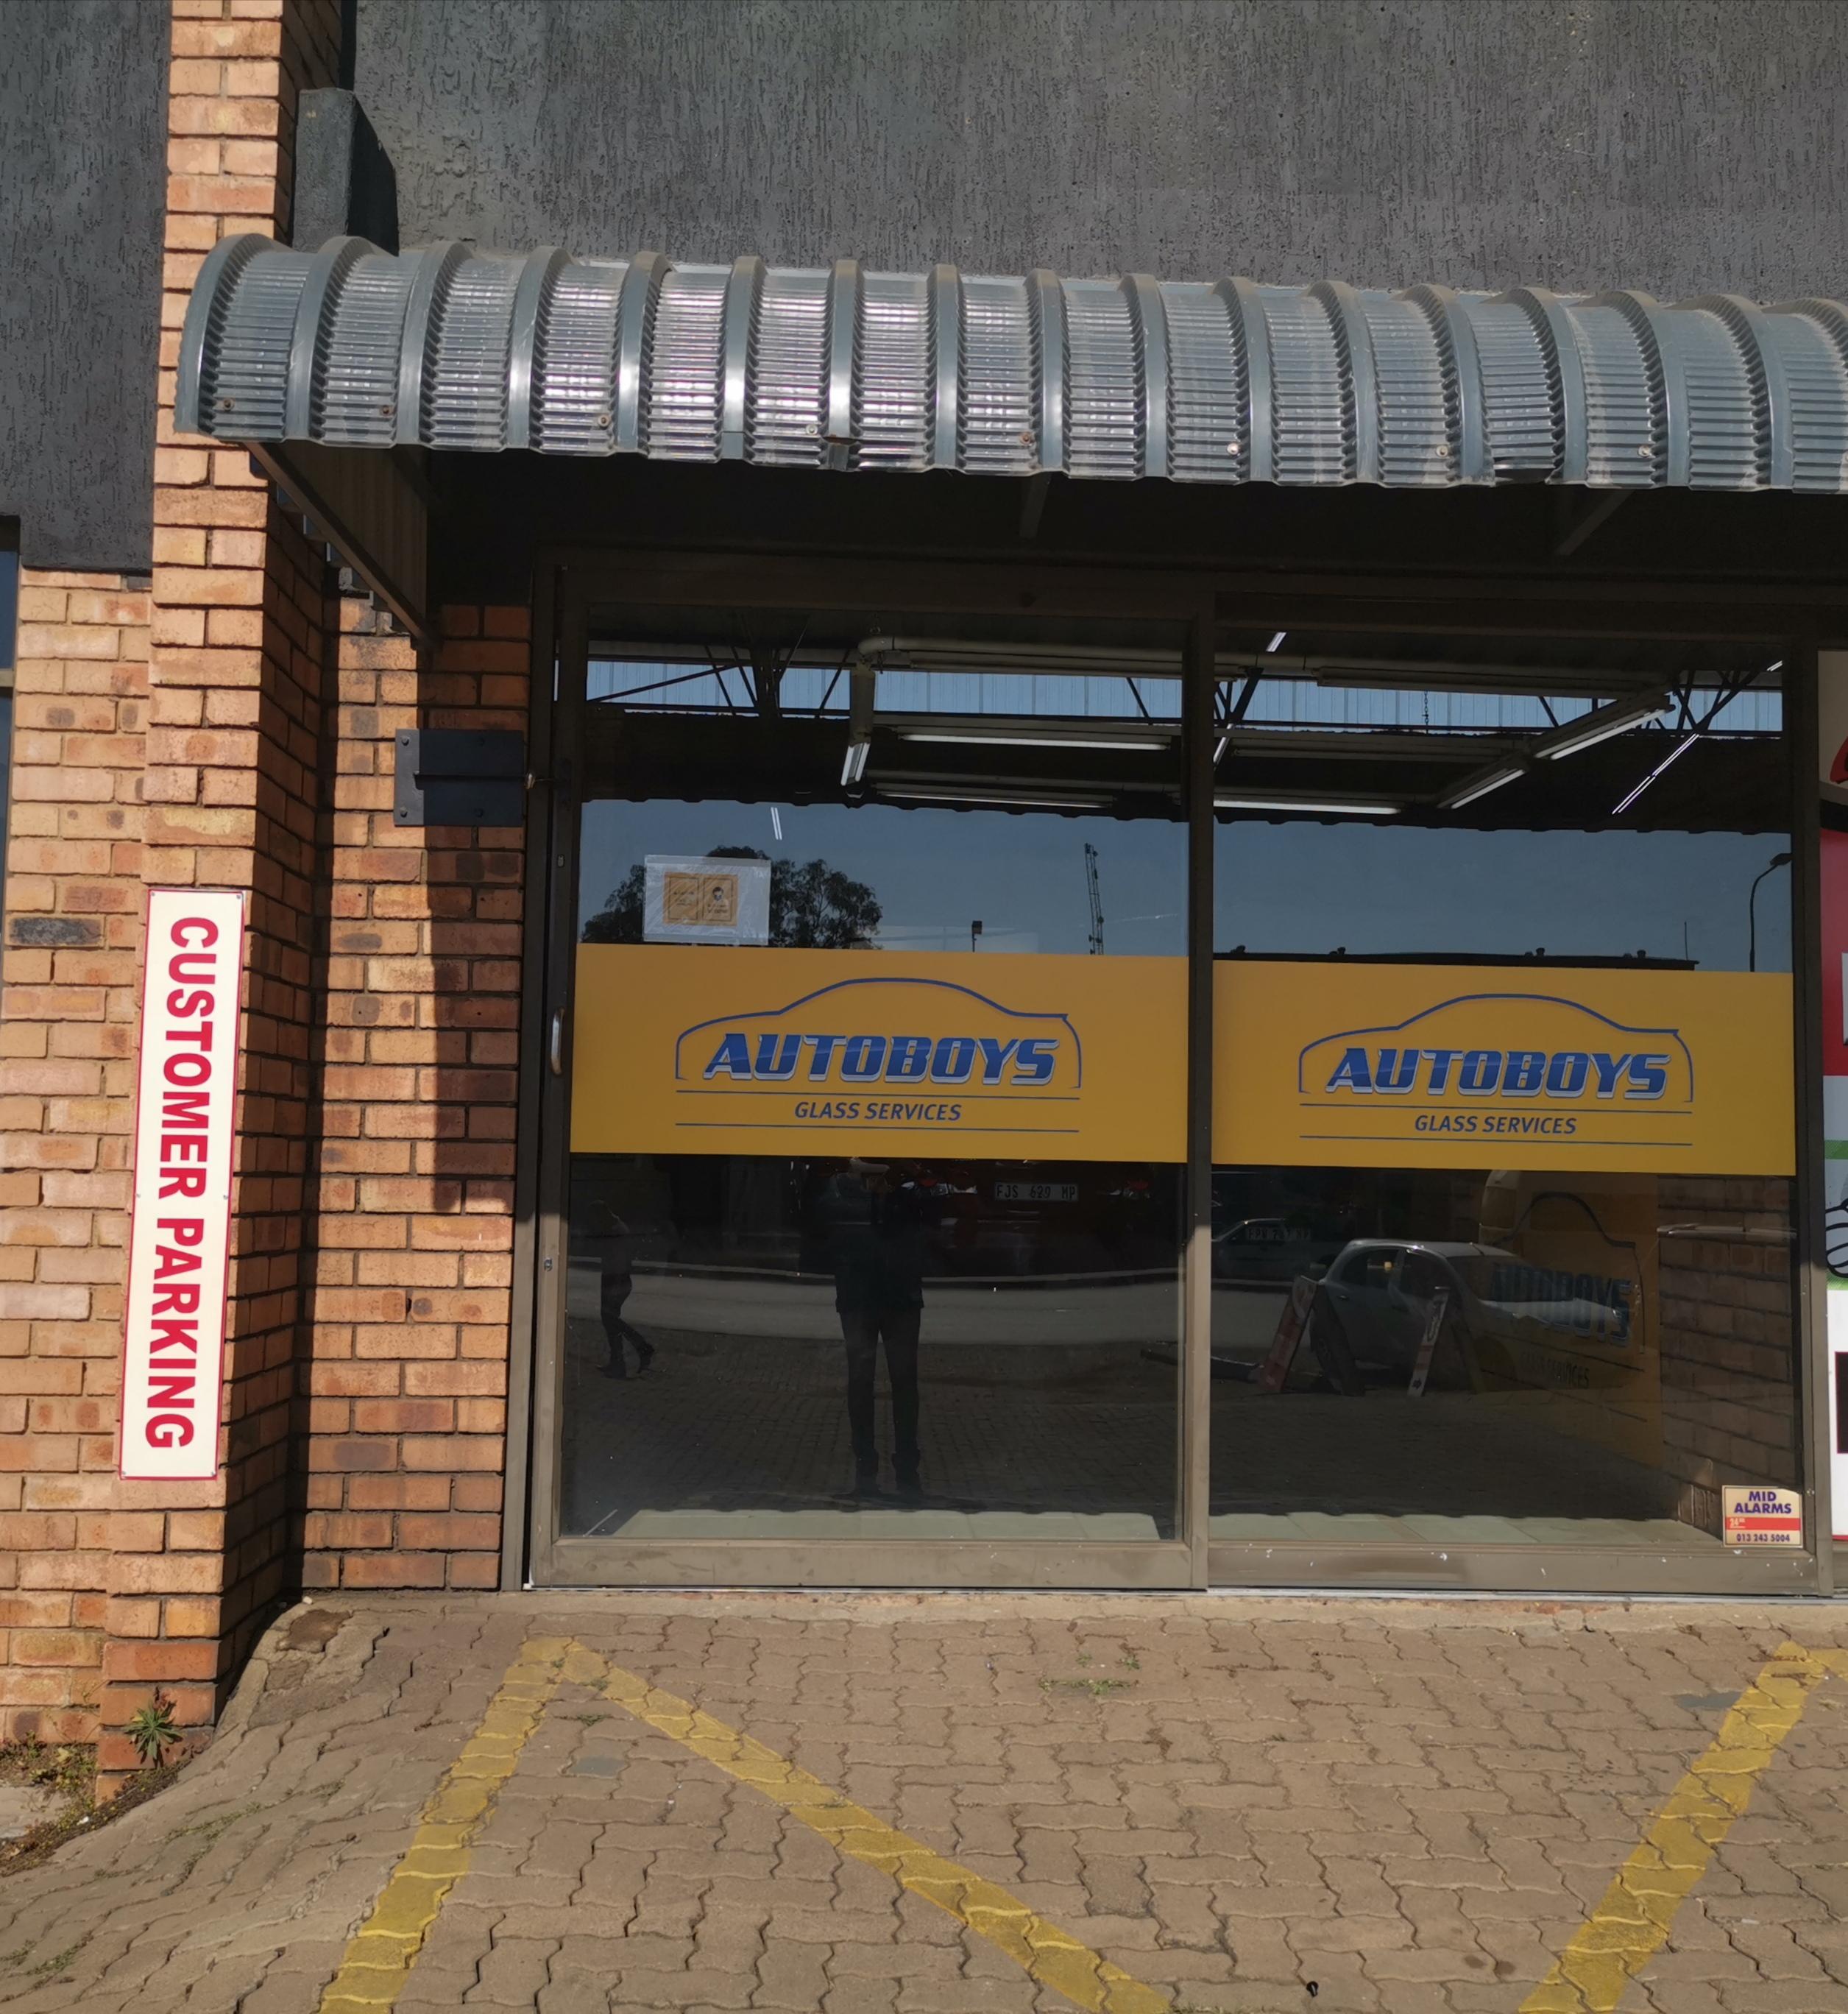 Autoboys-Middelburg